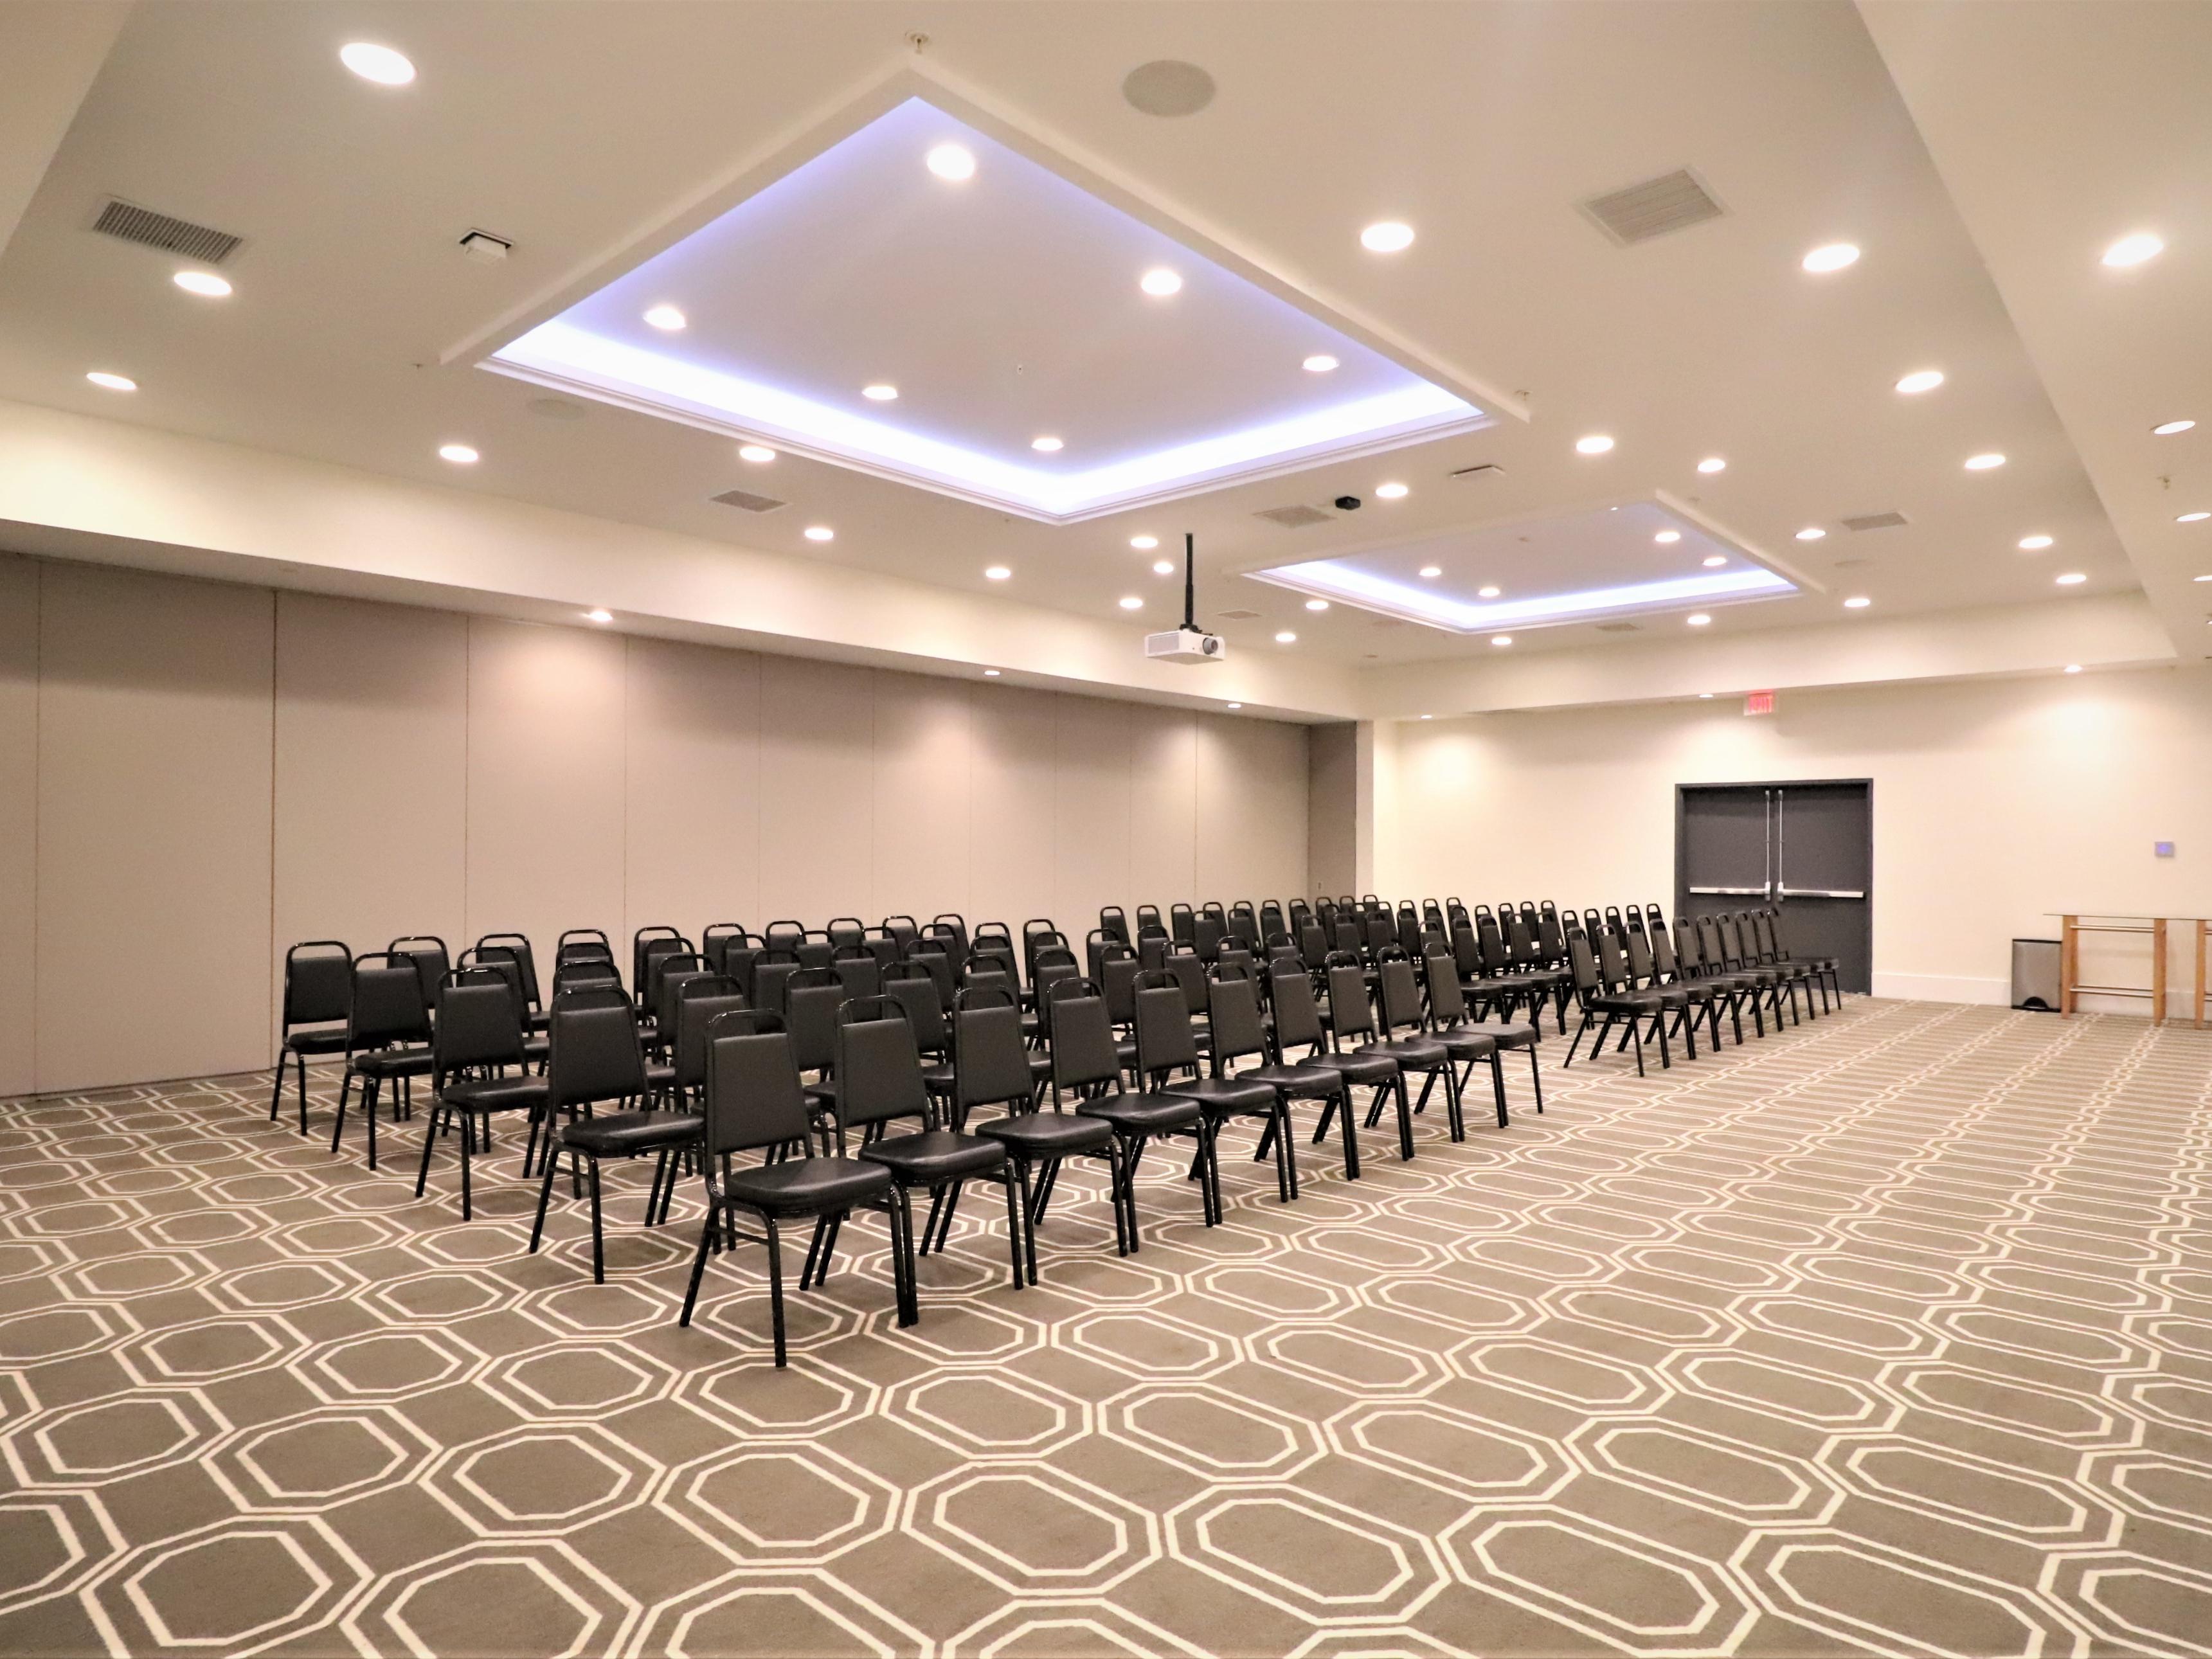 Harborside Hotel Infinity Ballroom Theater Seating